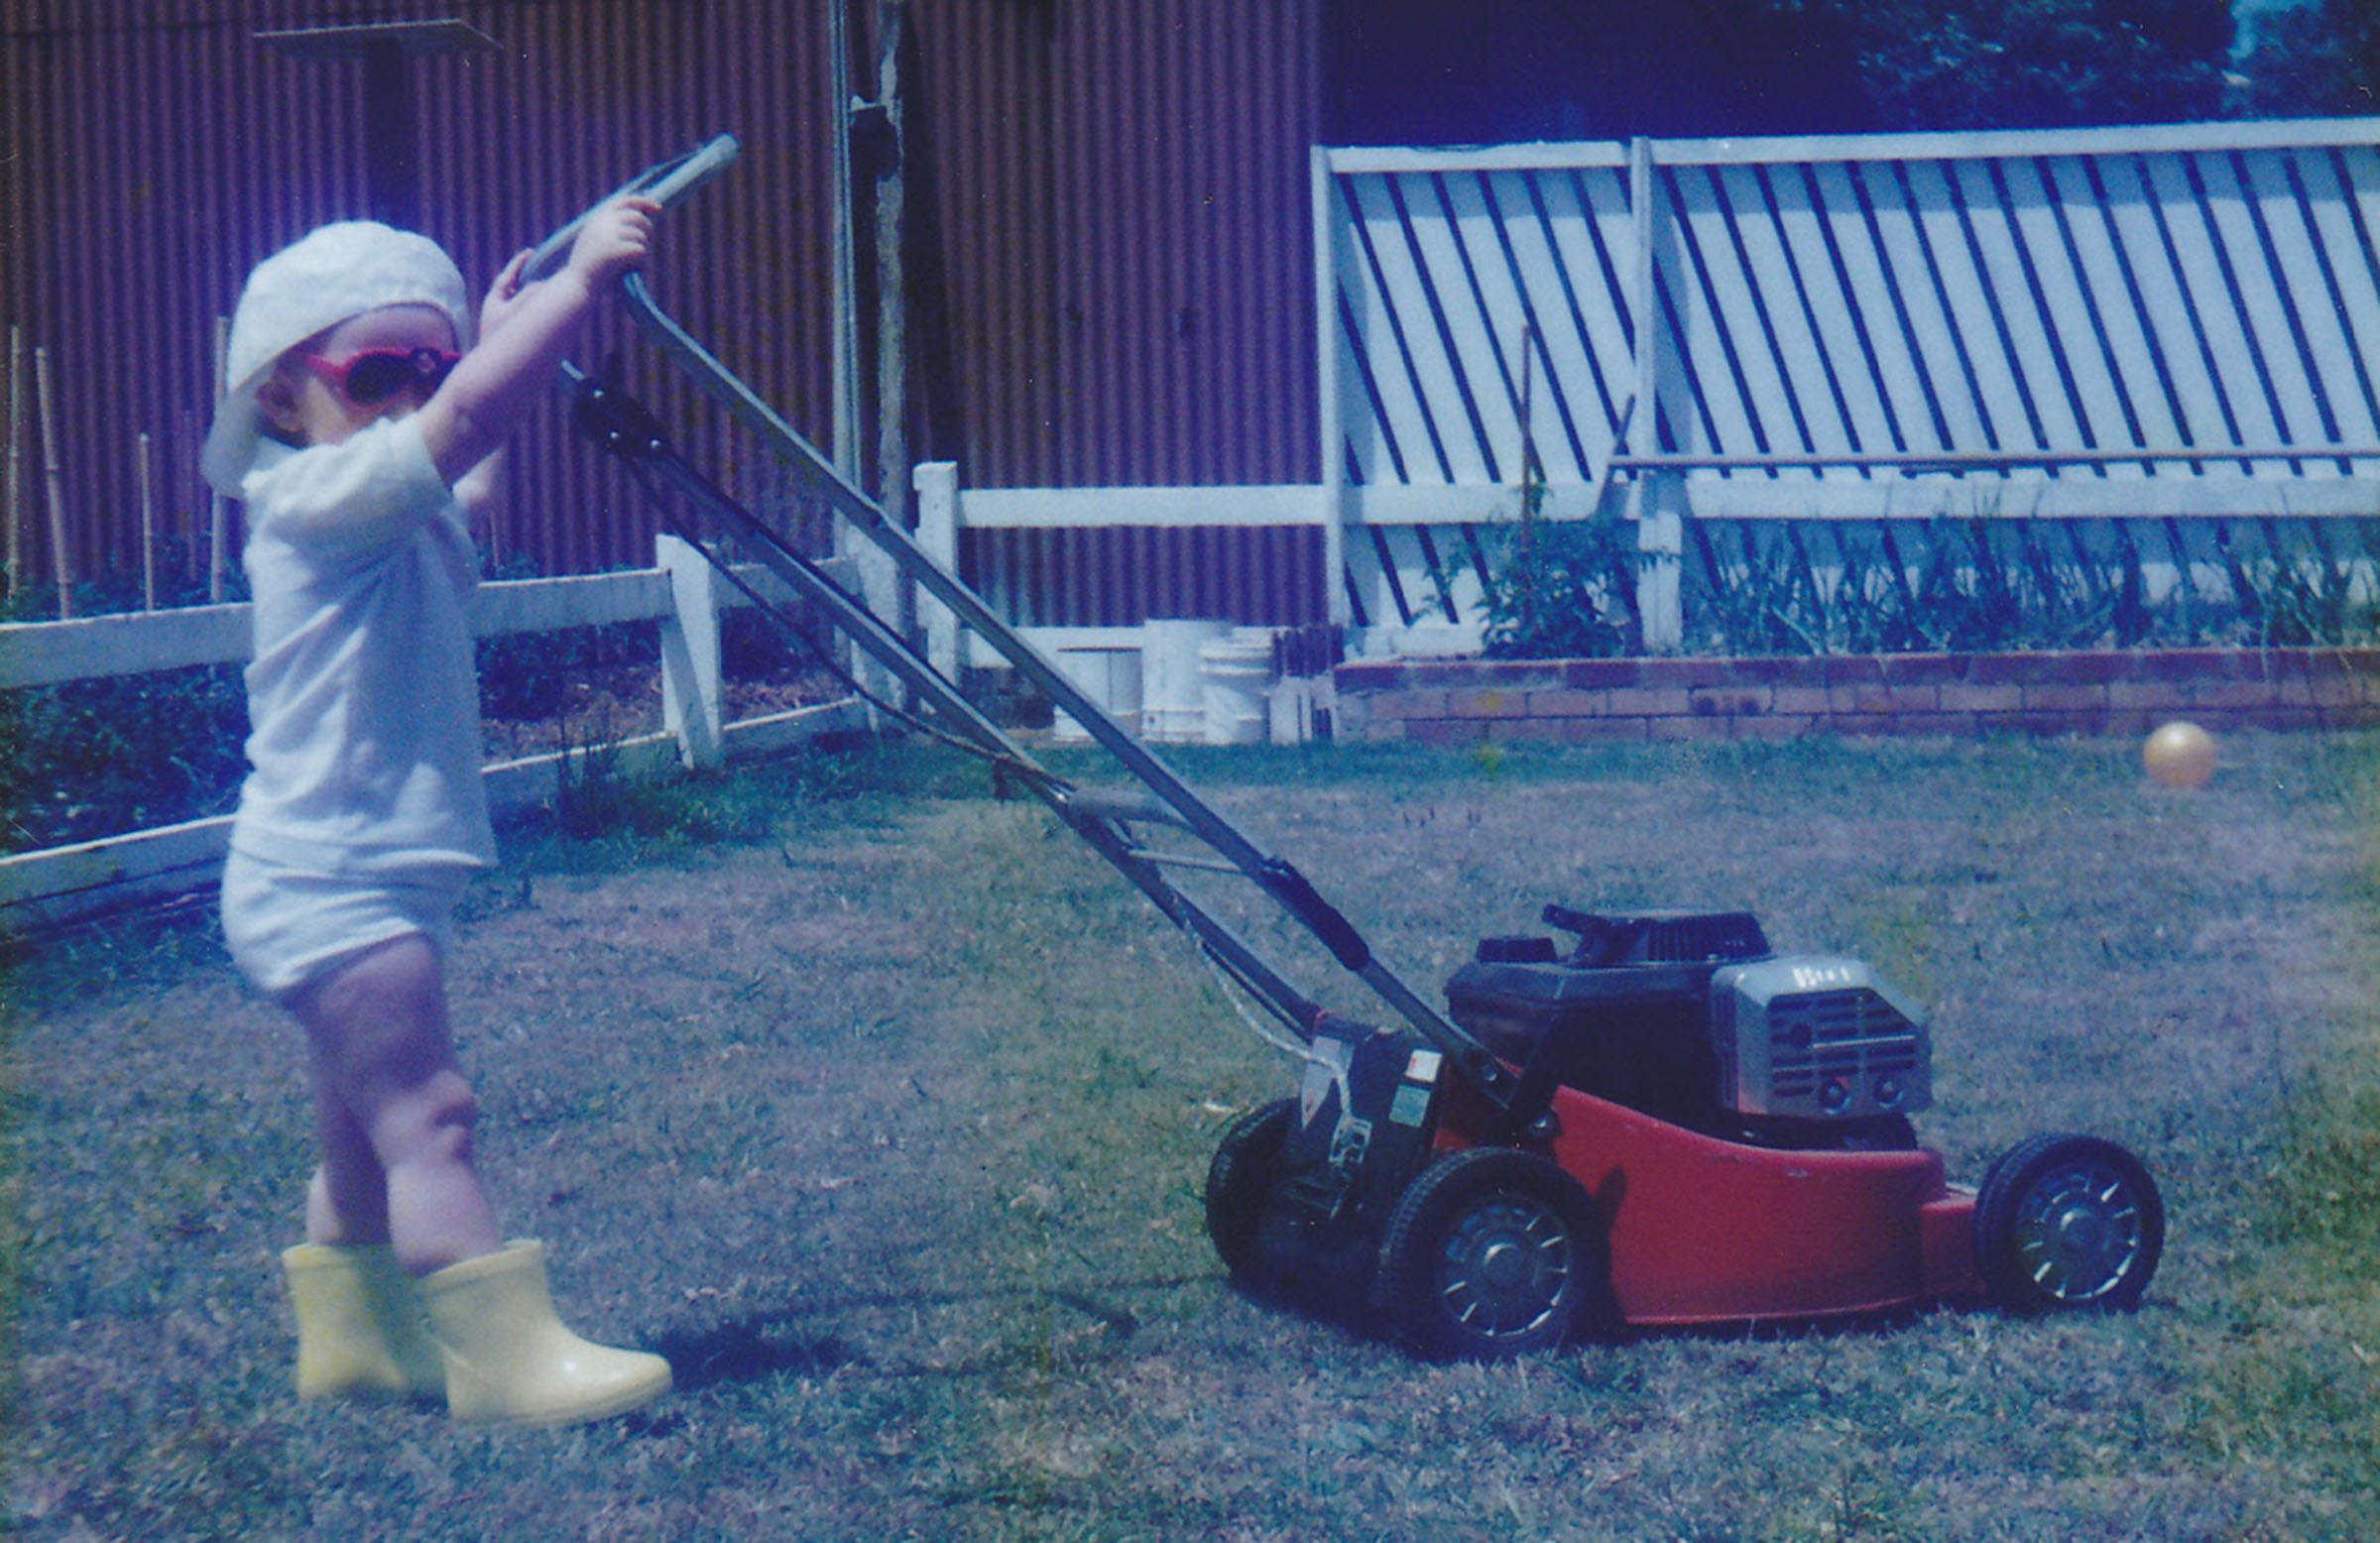 Backyard chores as a youngster in Albury-Wodonga